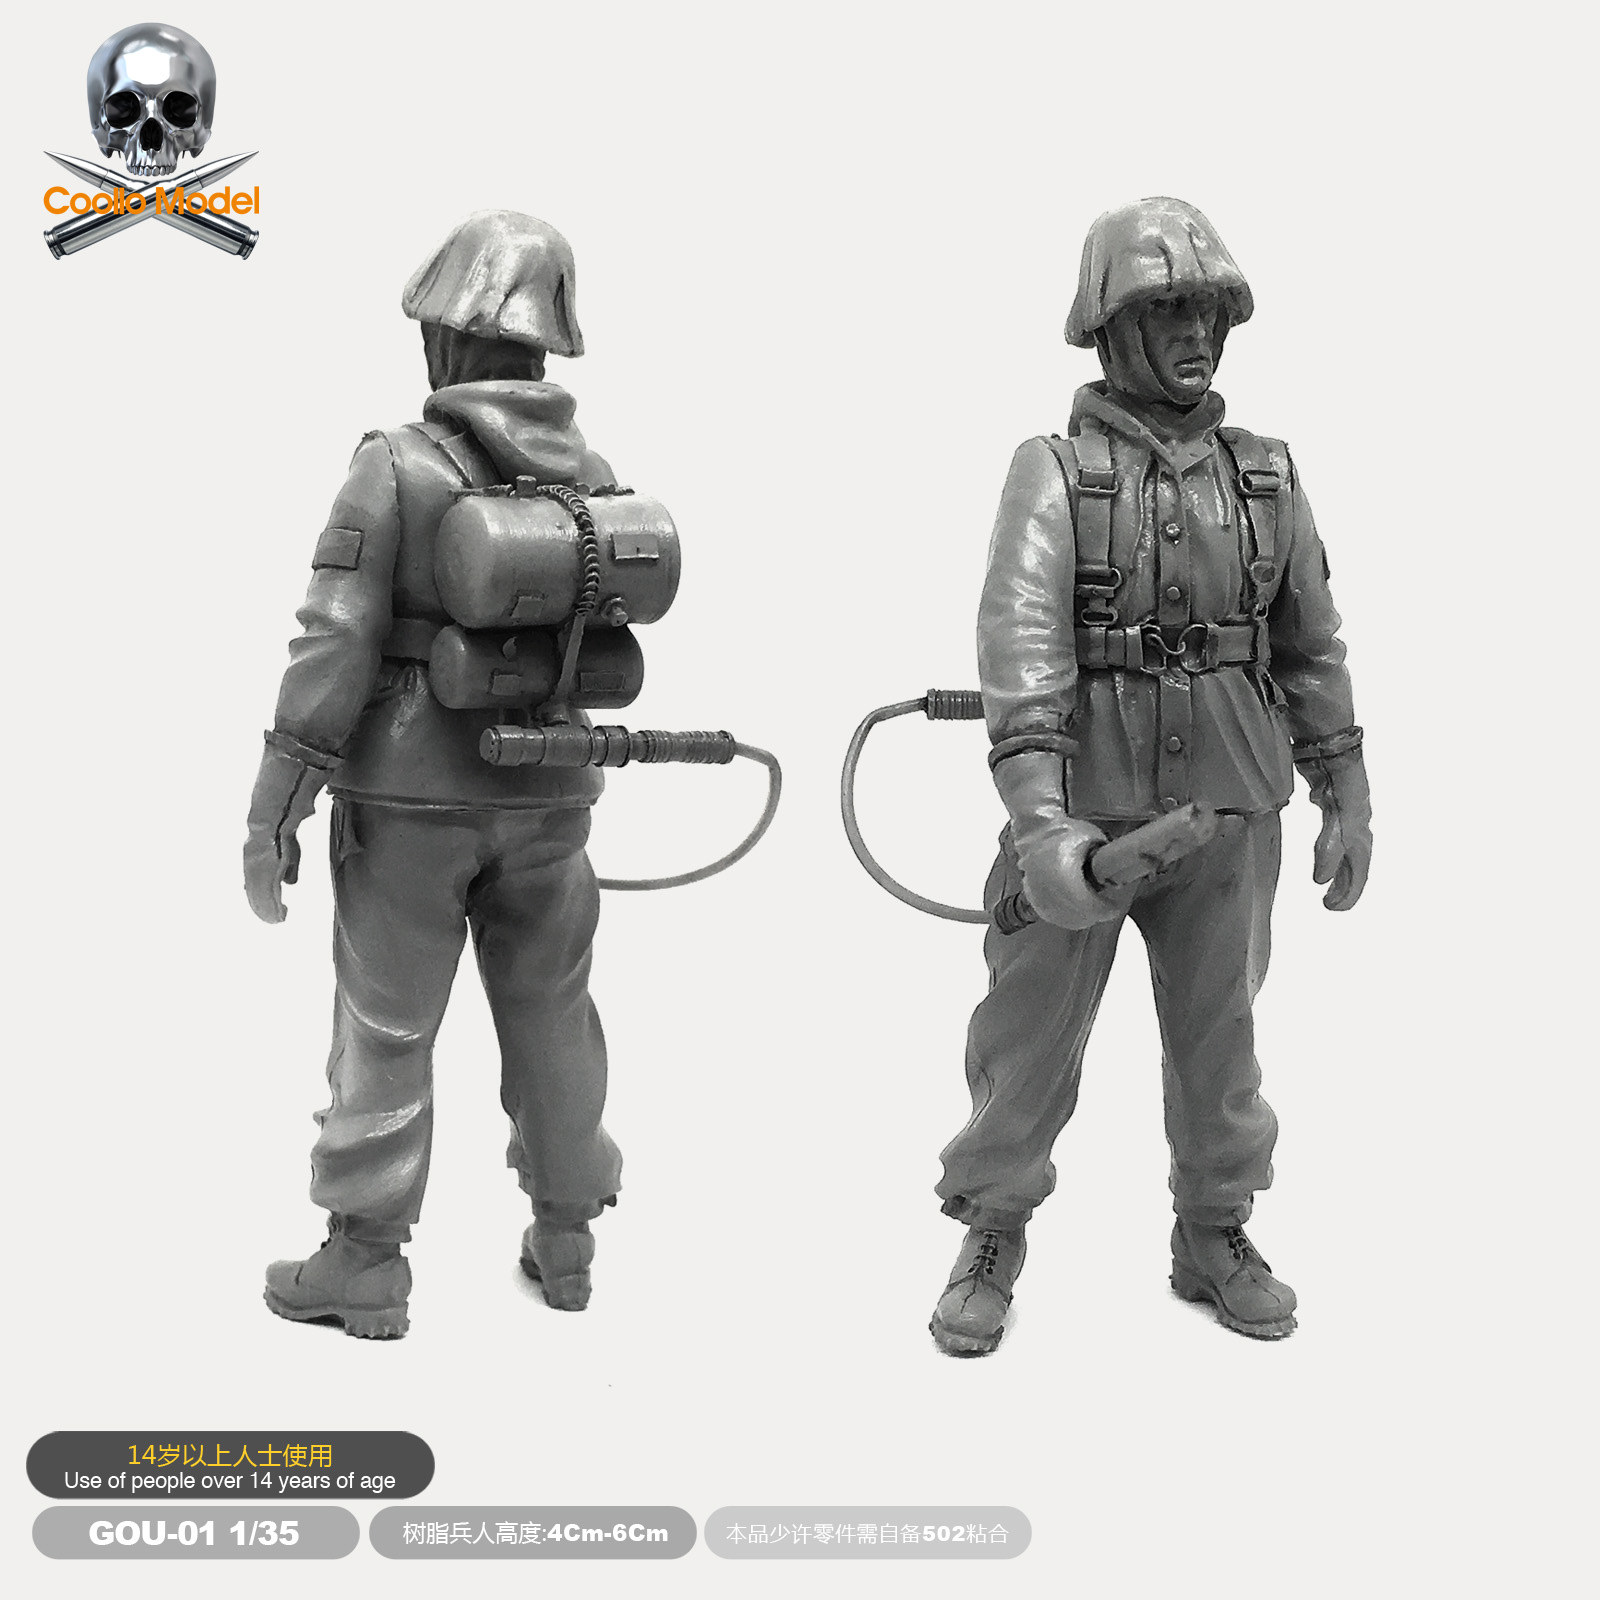 1/35  Resin  Soldier Gunners Model Figure Kits  Self-assembled  Gou-01